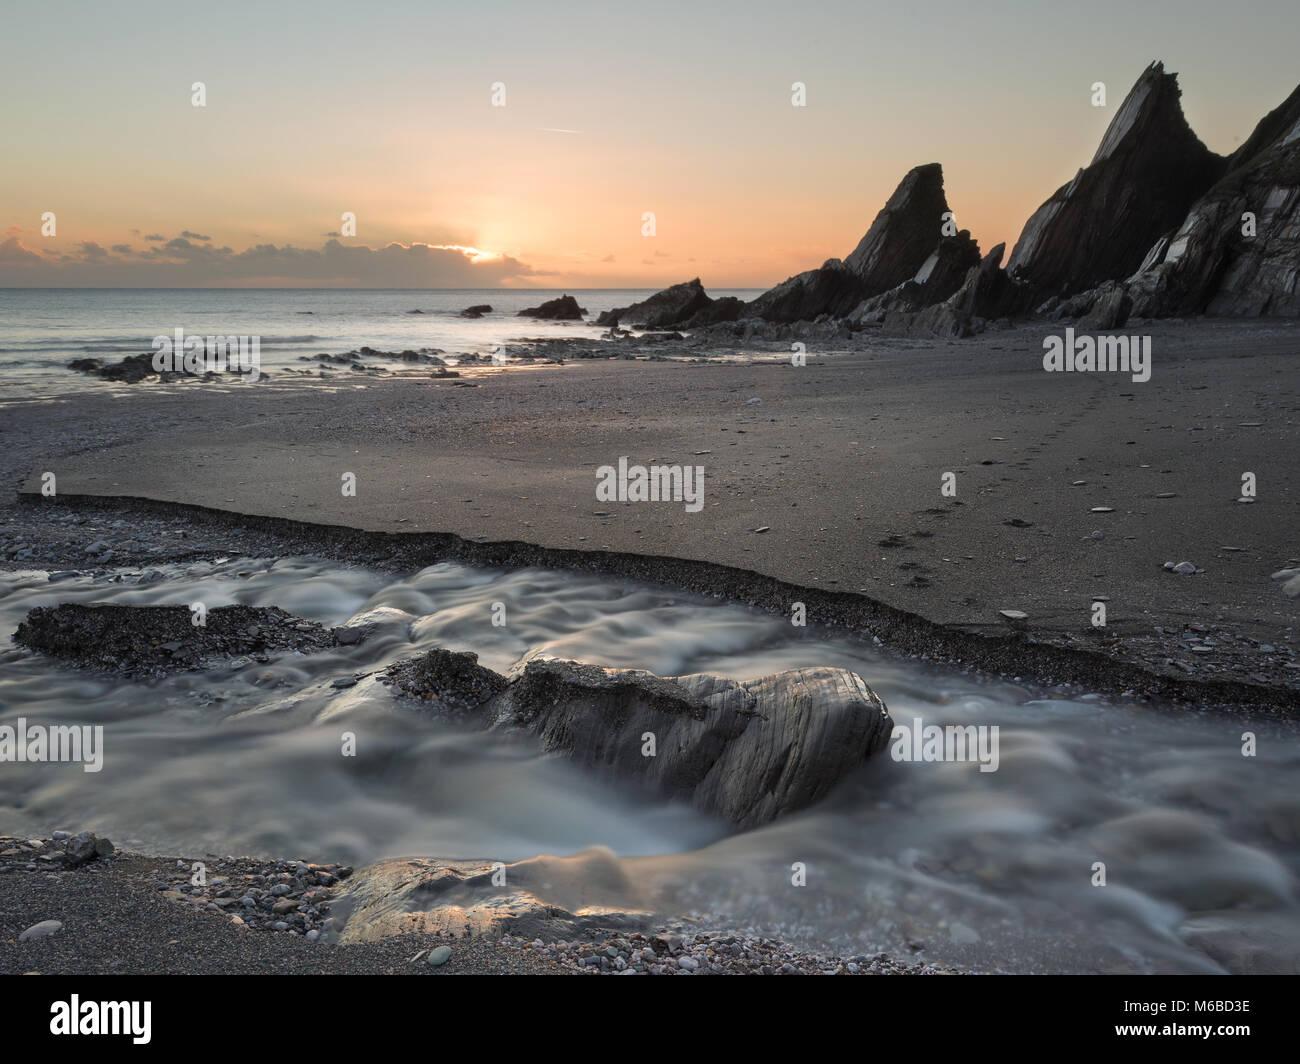 Westcombe Beach at sunset South Hams - Stock Image